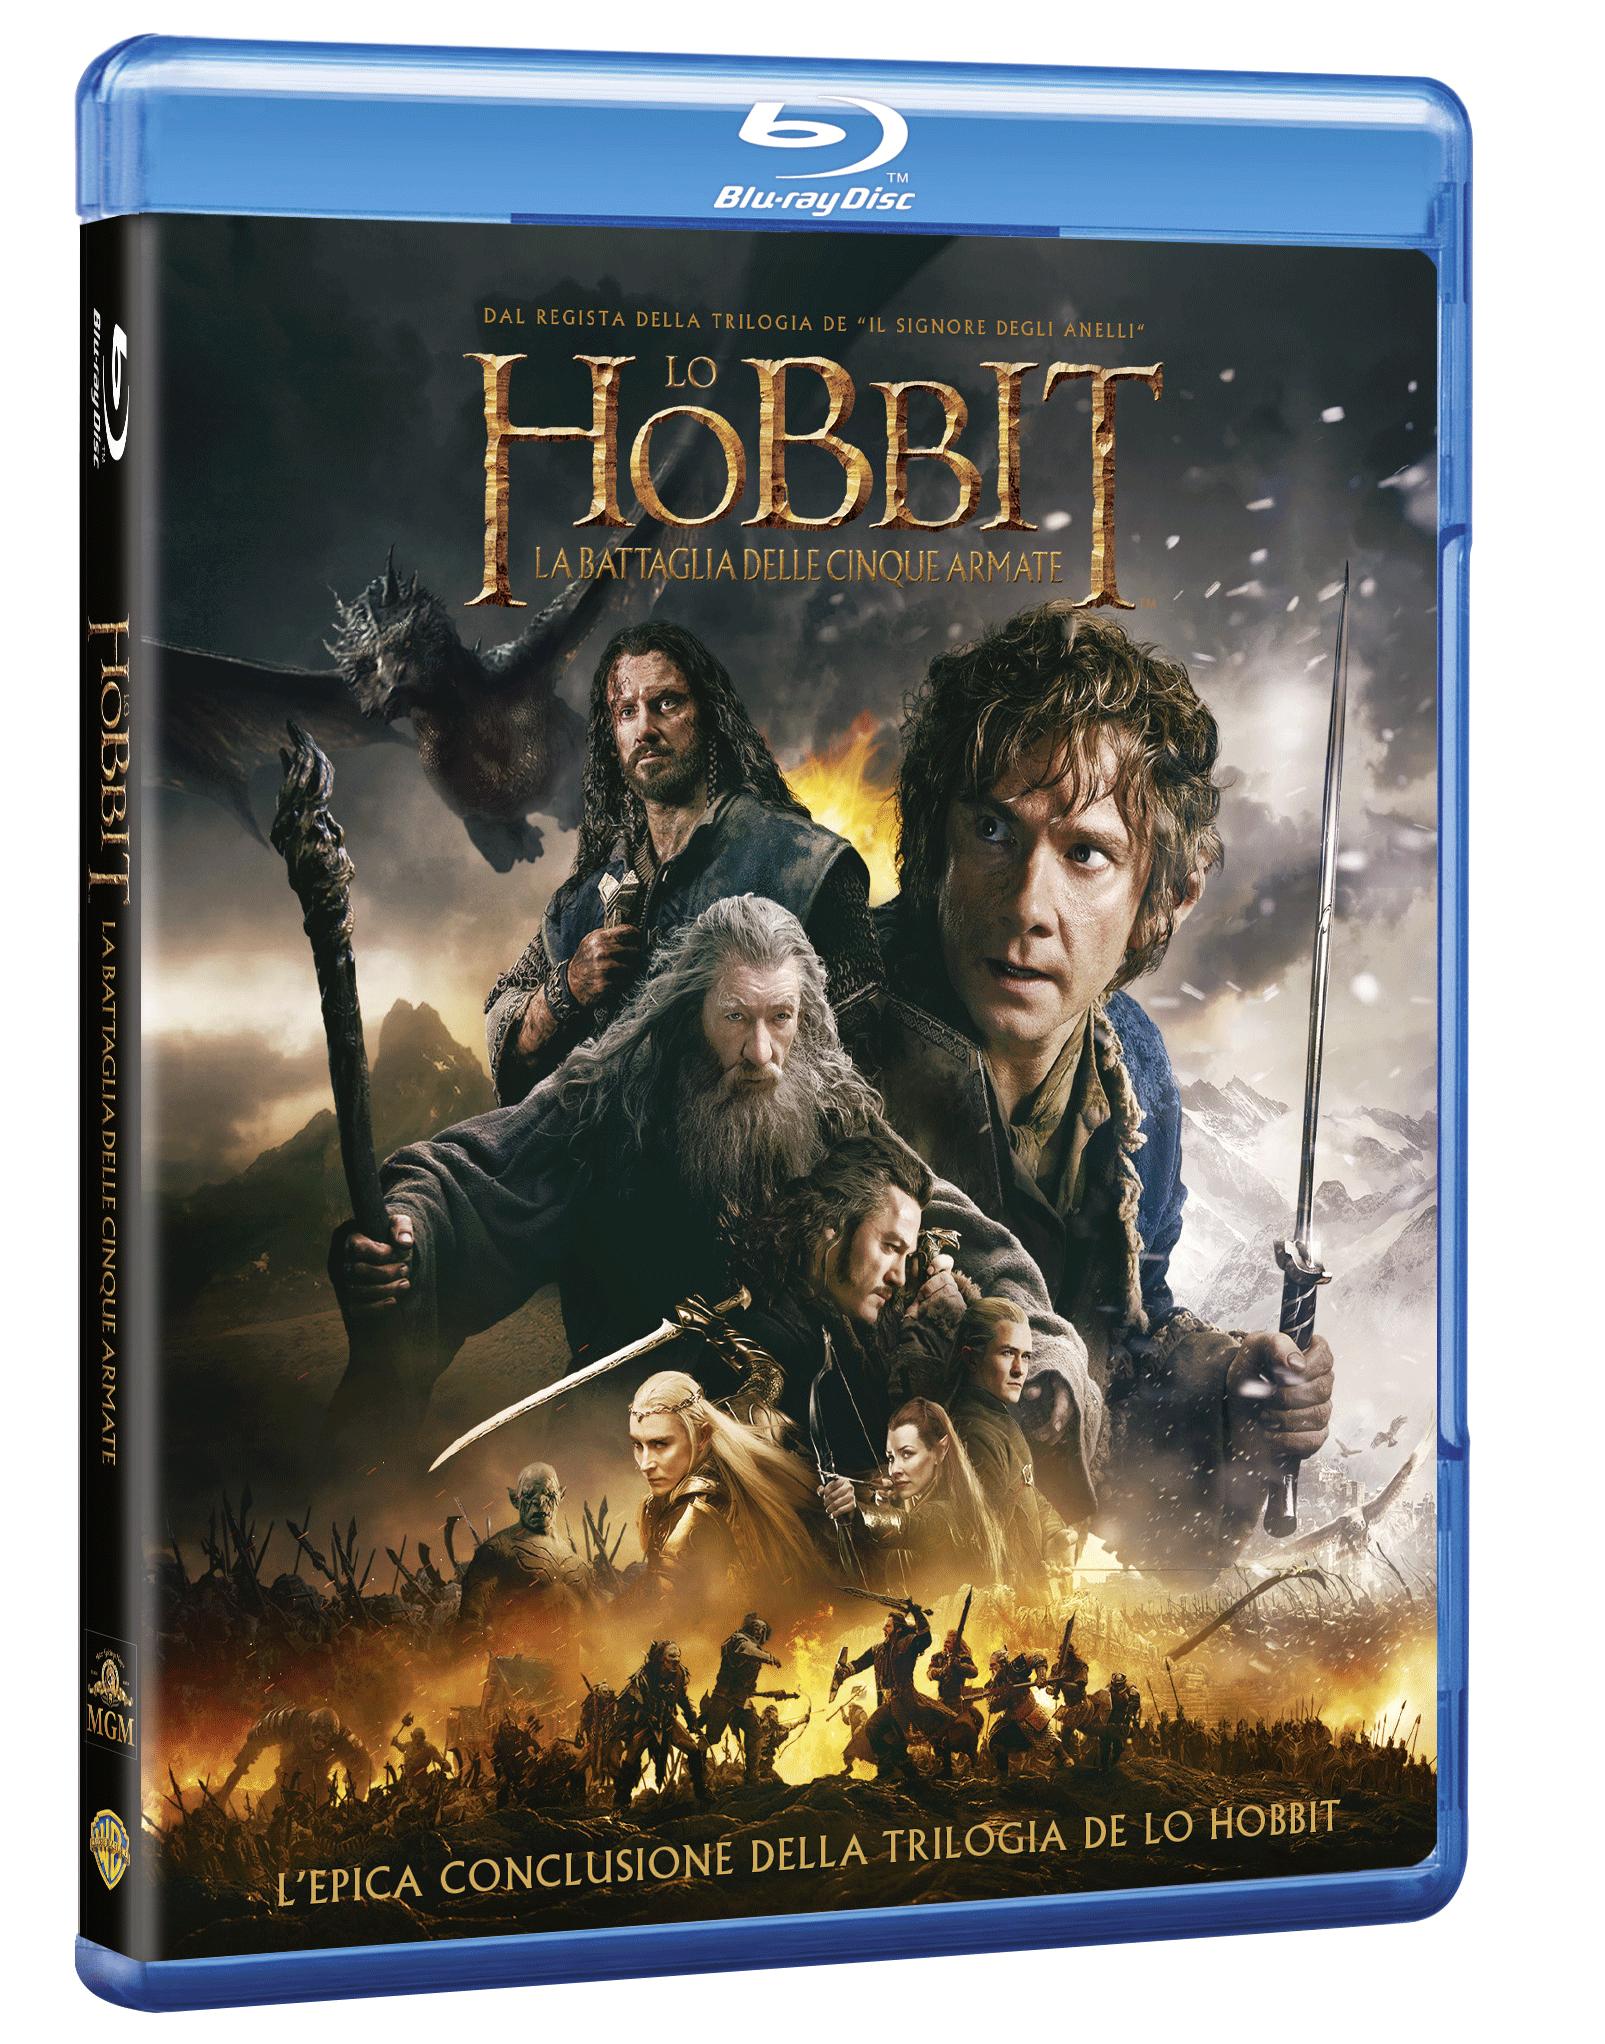 lo hobbit 3 blu-ray